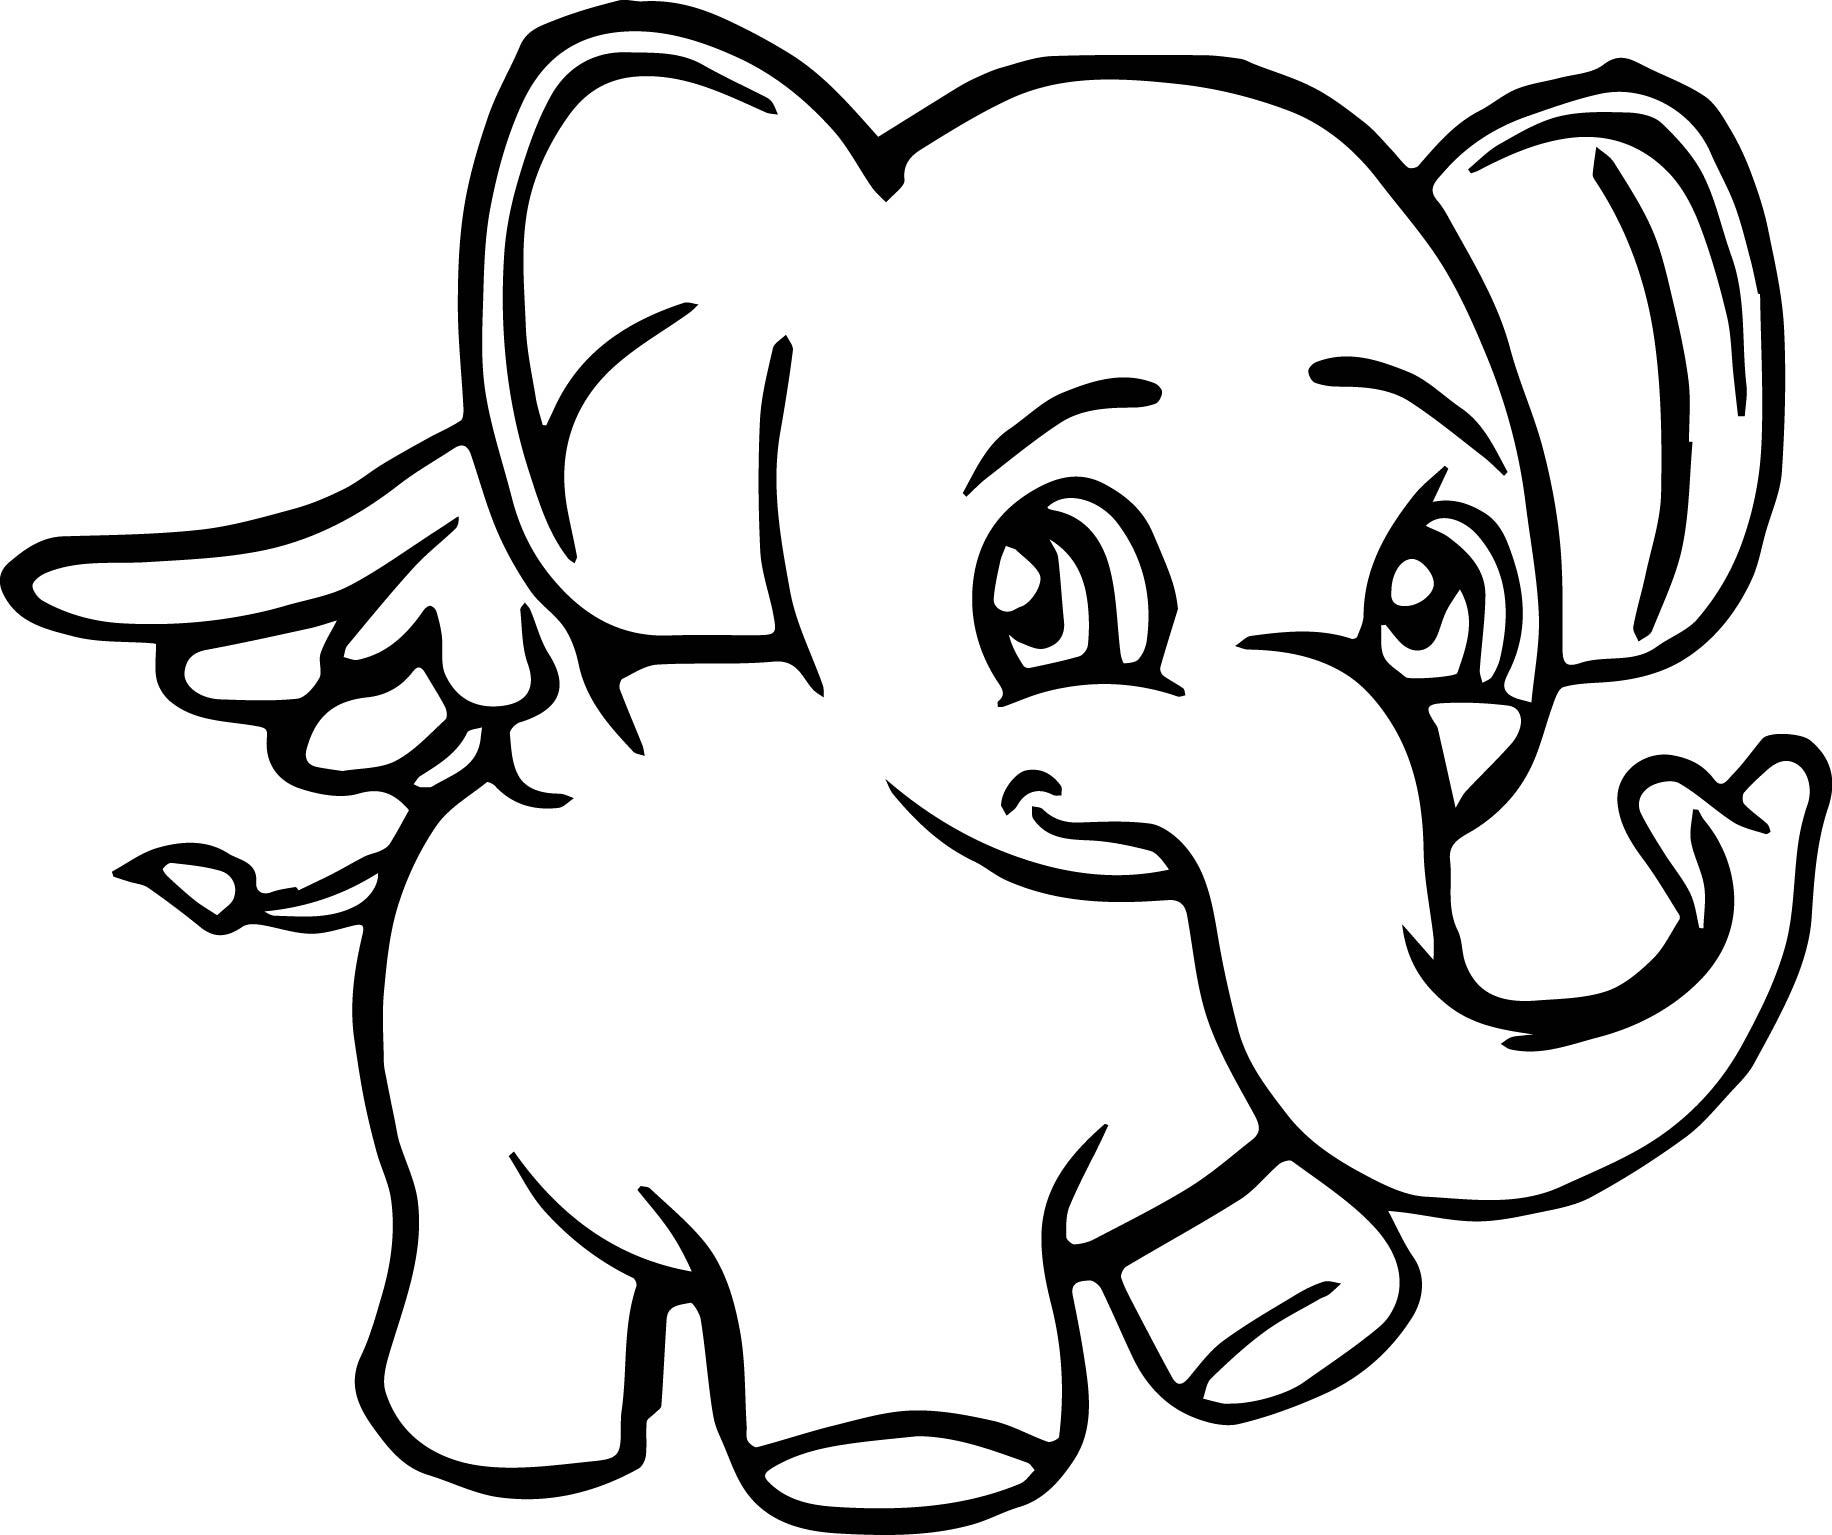 1832x1535 Angel Elephant Cartoon Coloring Page Wecoloringpage